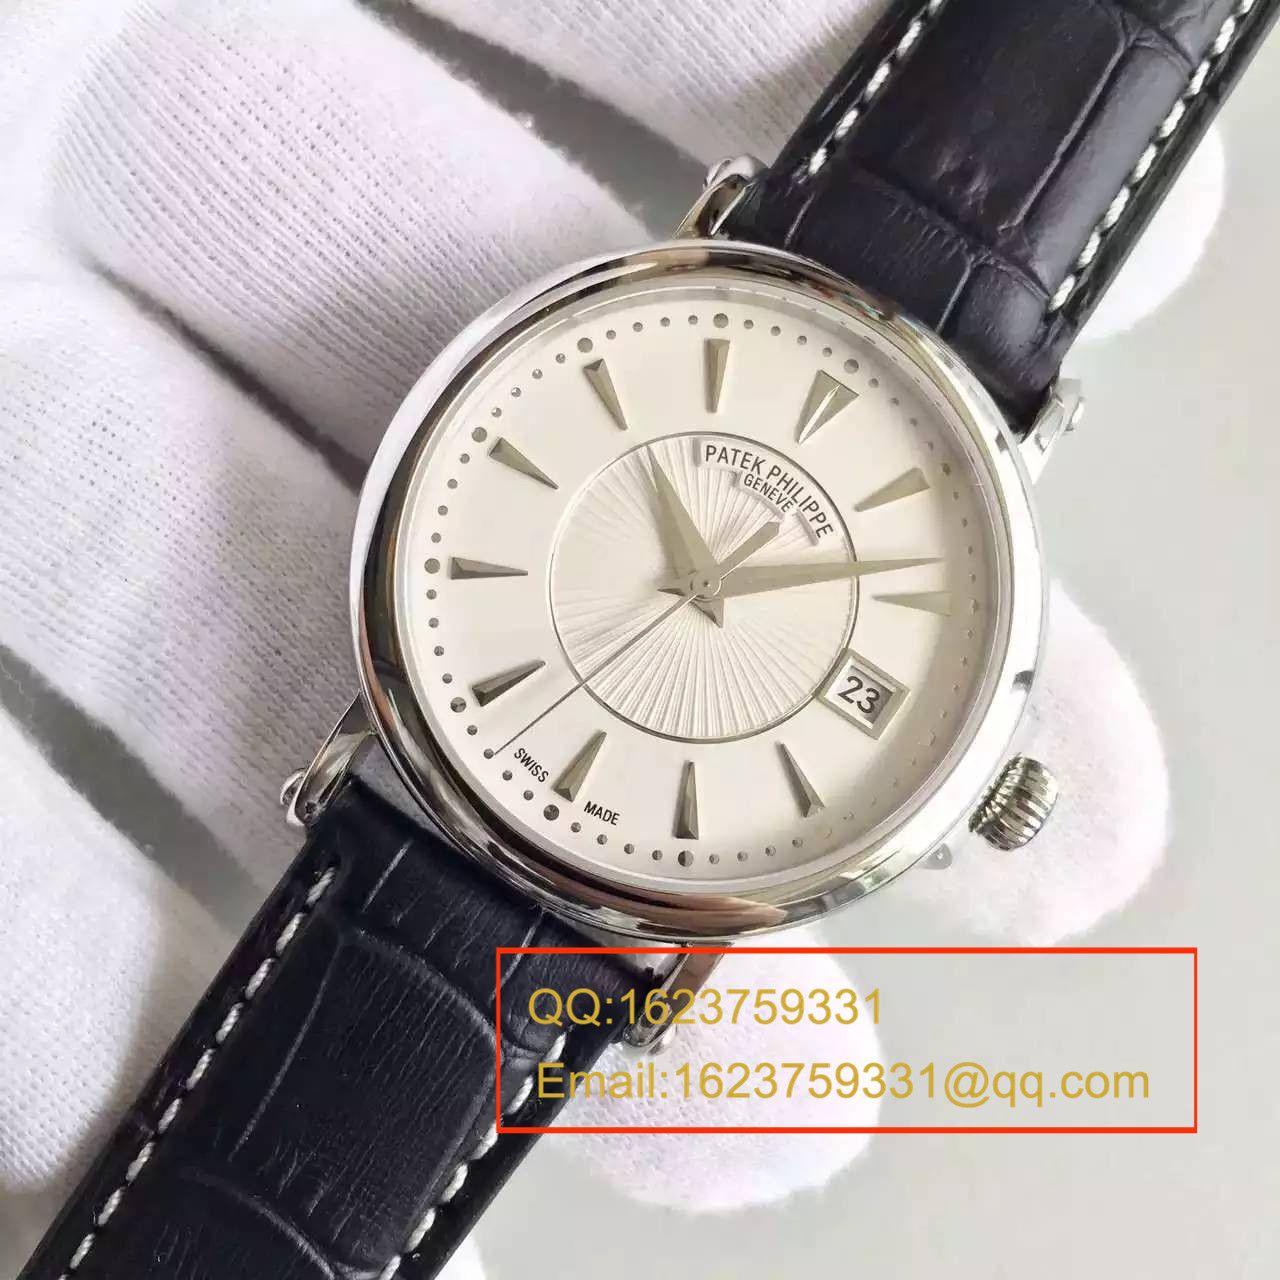 【HT一比一高仿手表】百达翡丽古典表系列5153G-010机械腕表